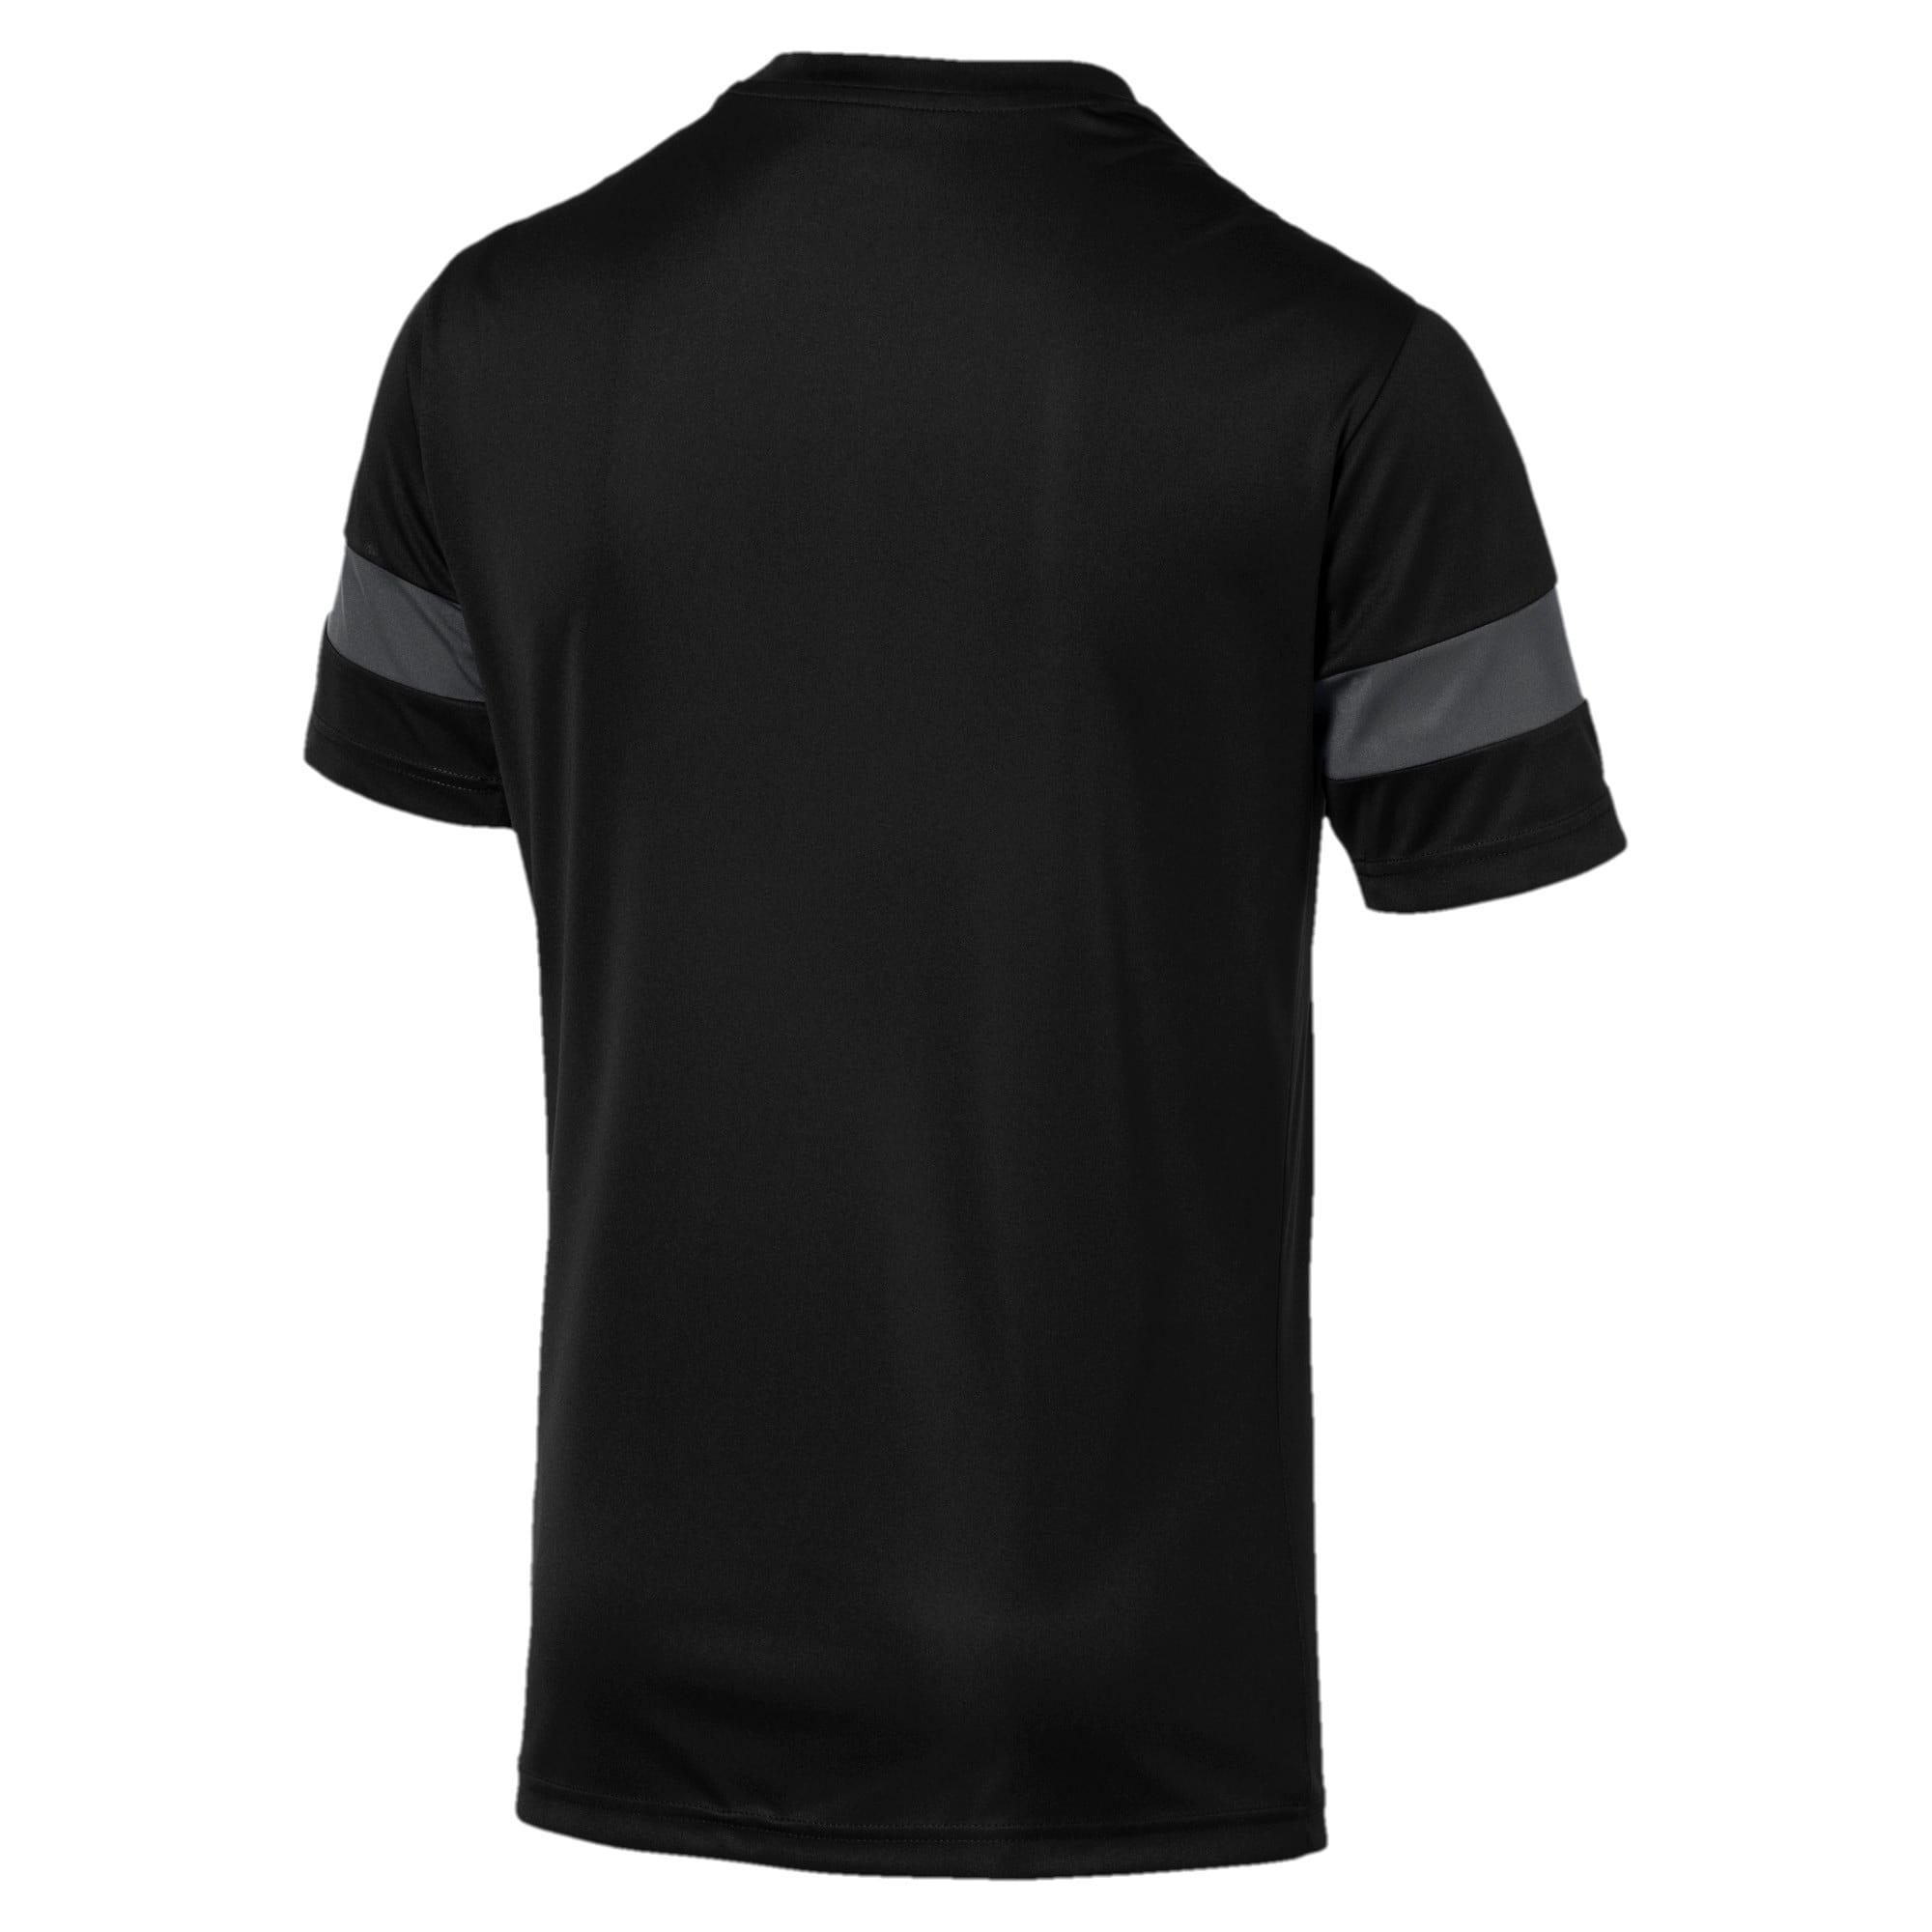 Thumbnail 5 of Trainingsshirt voor heren, Puma Black-Asphalt, medium